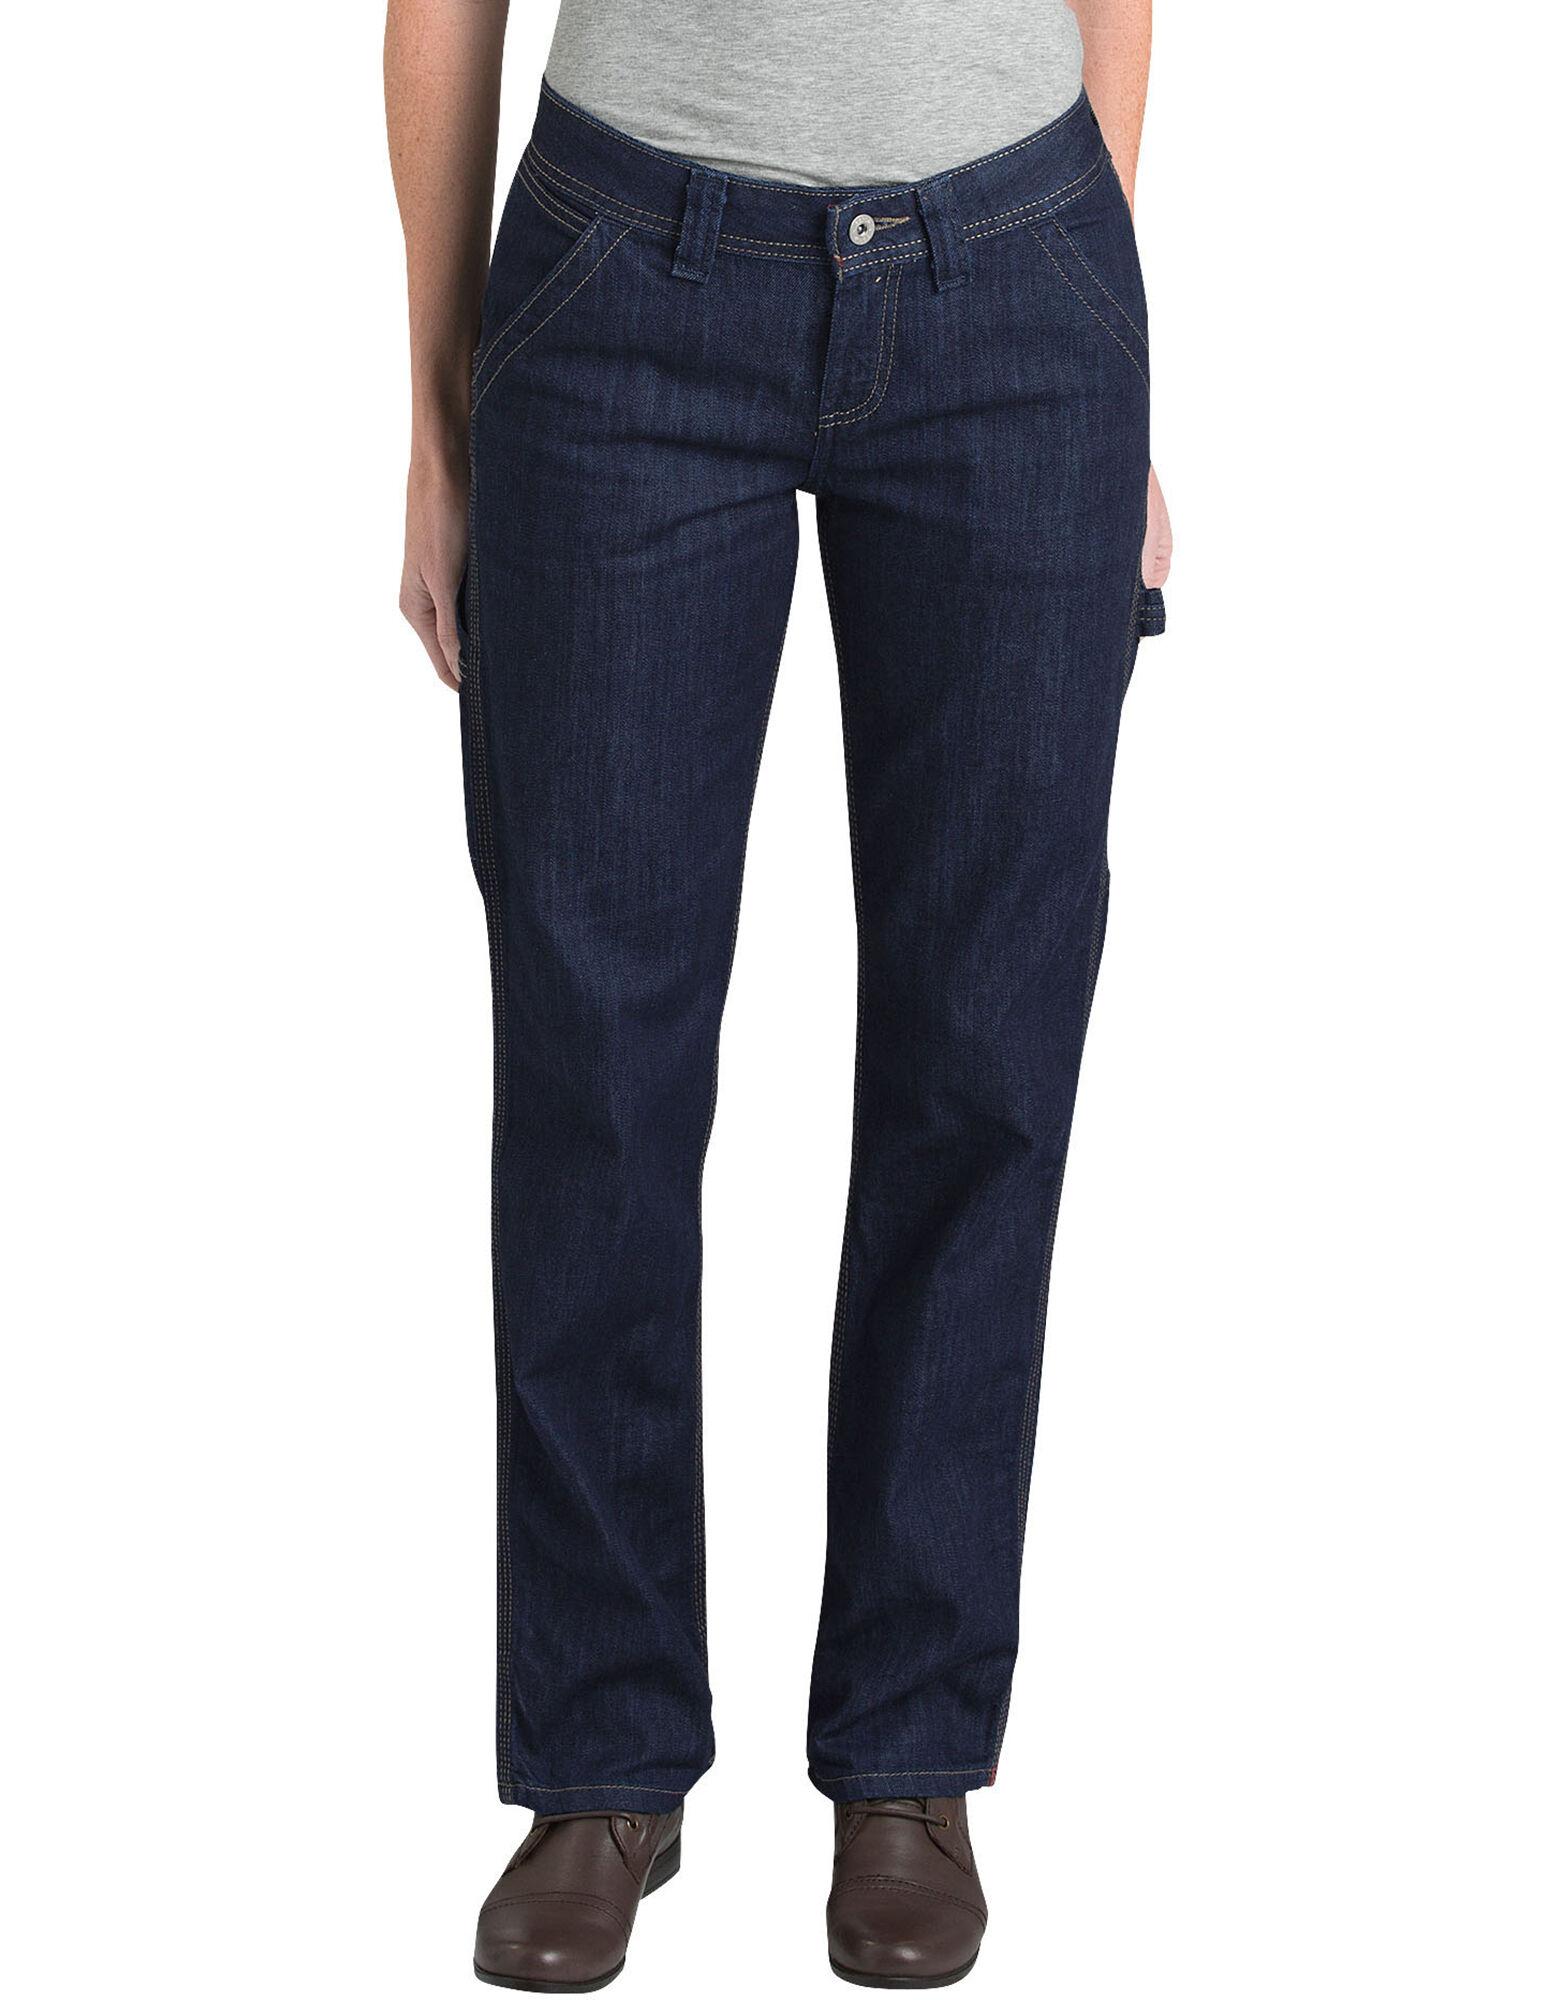 Womens Carpenter Jeans Cfetma2s